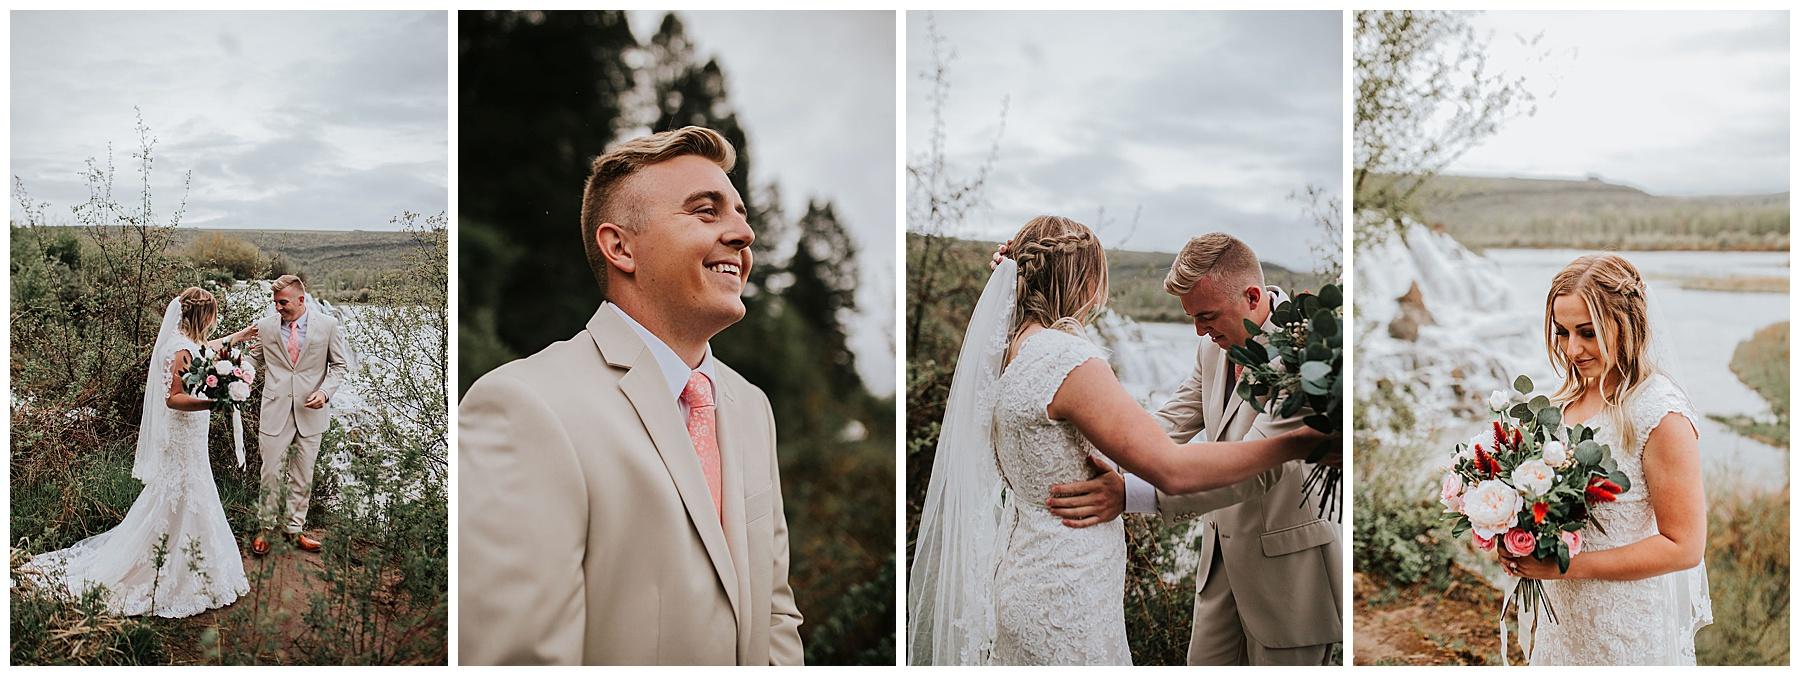 waterfall-bridals-fallcreekfalls